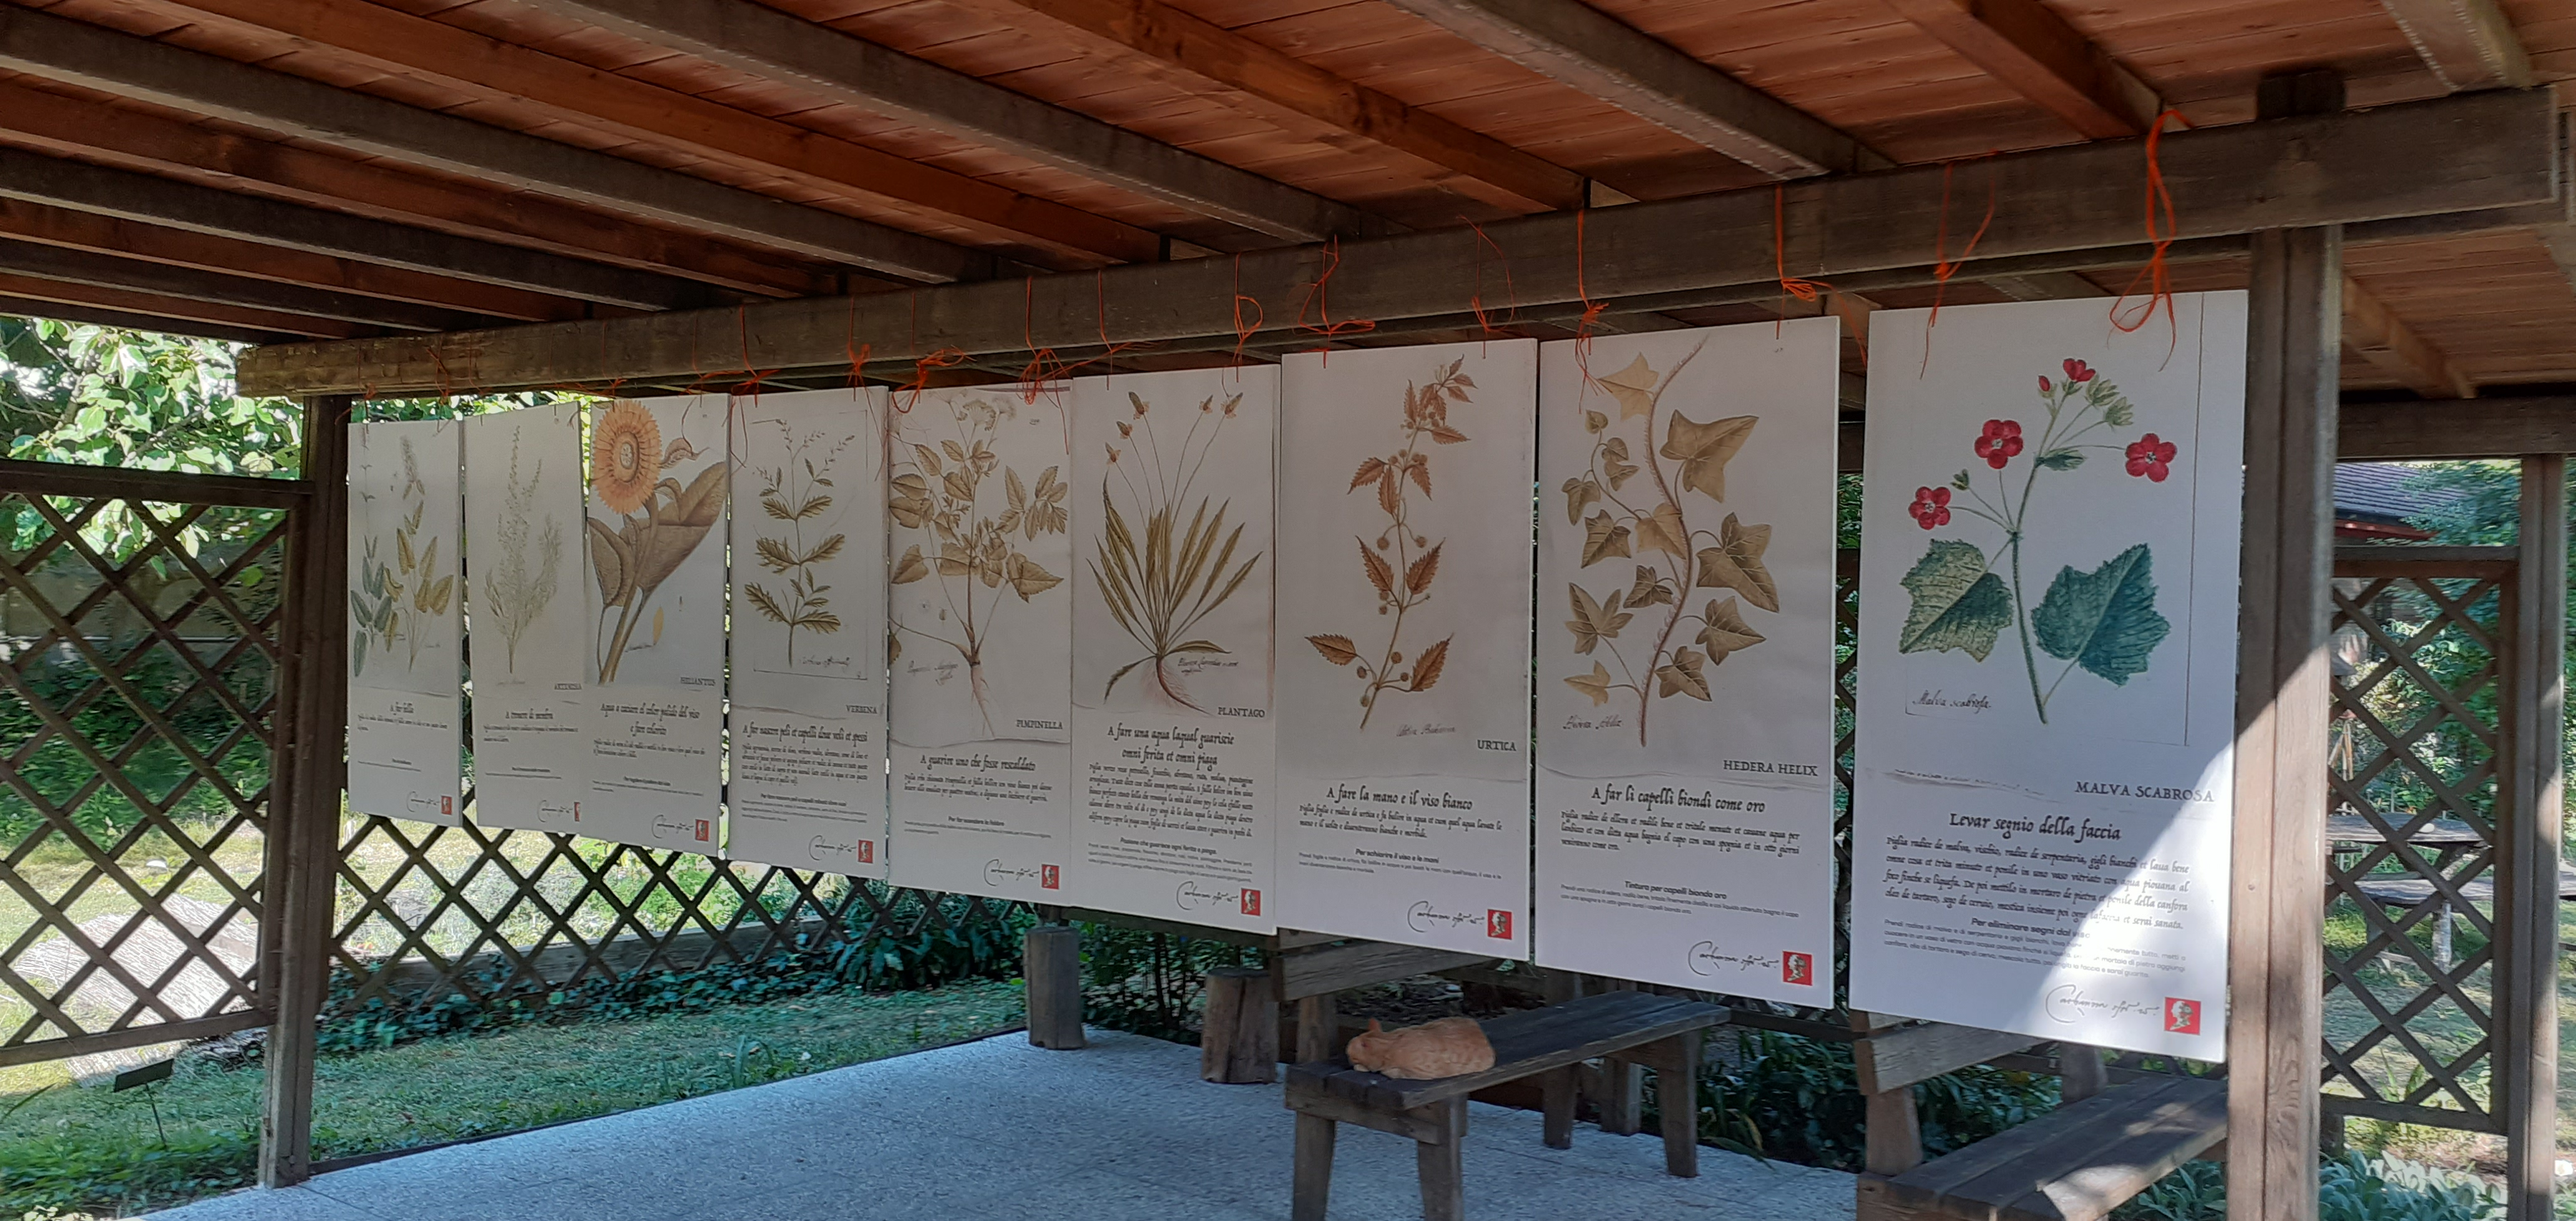 Cocla-13-giu-21-3-Tavole-botaniche-Maioli